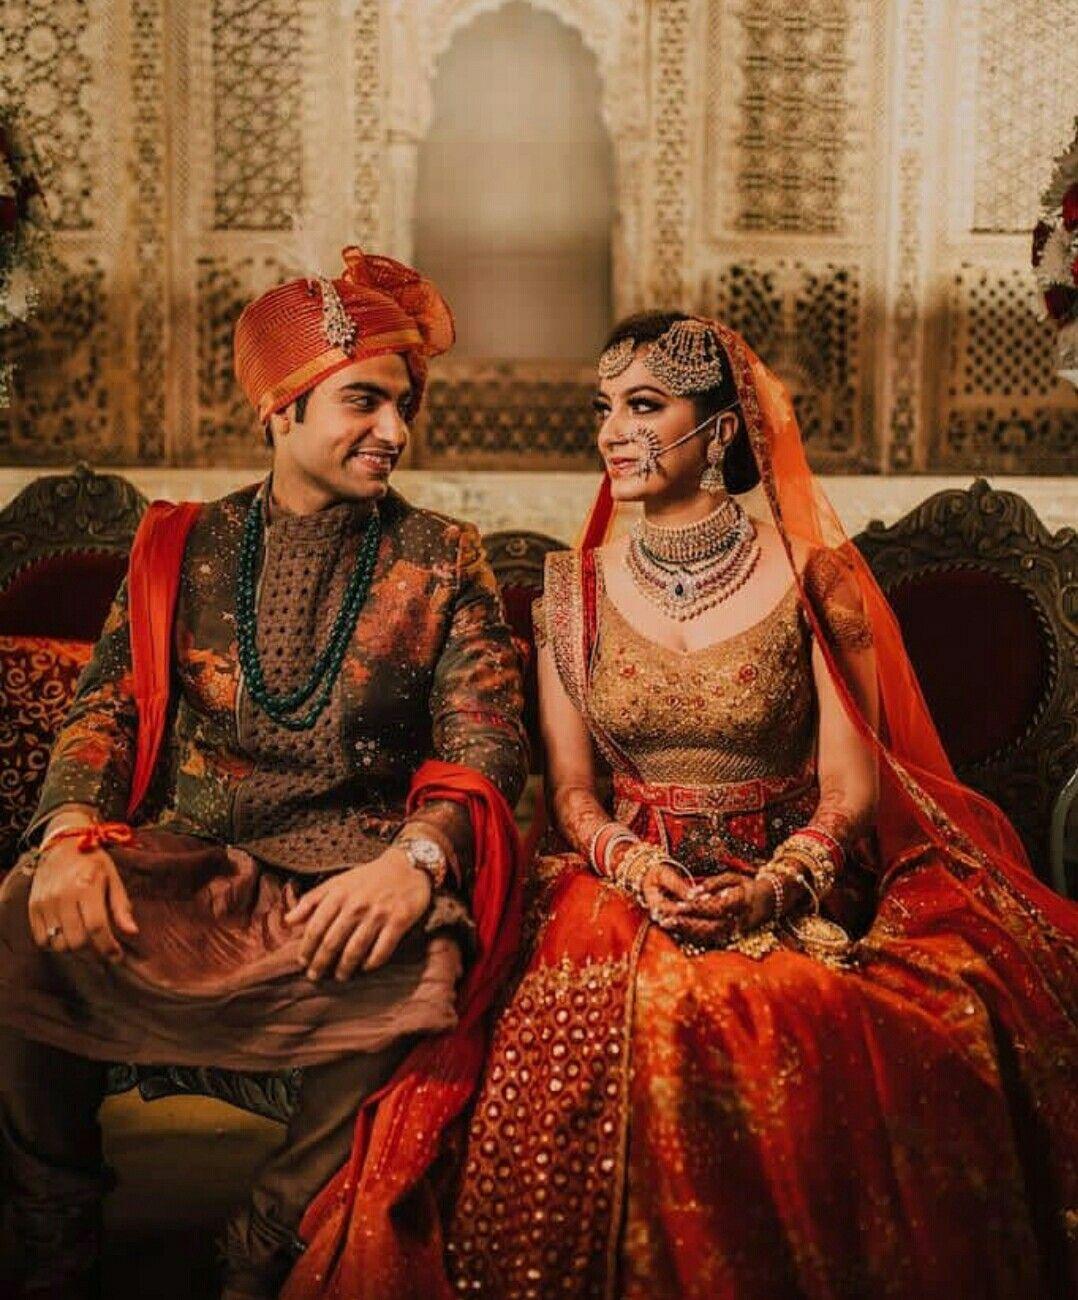 Rajput wedding dress  Pin by Cutipieanu on The big Fat wedding in   Pinterest